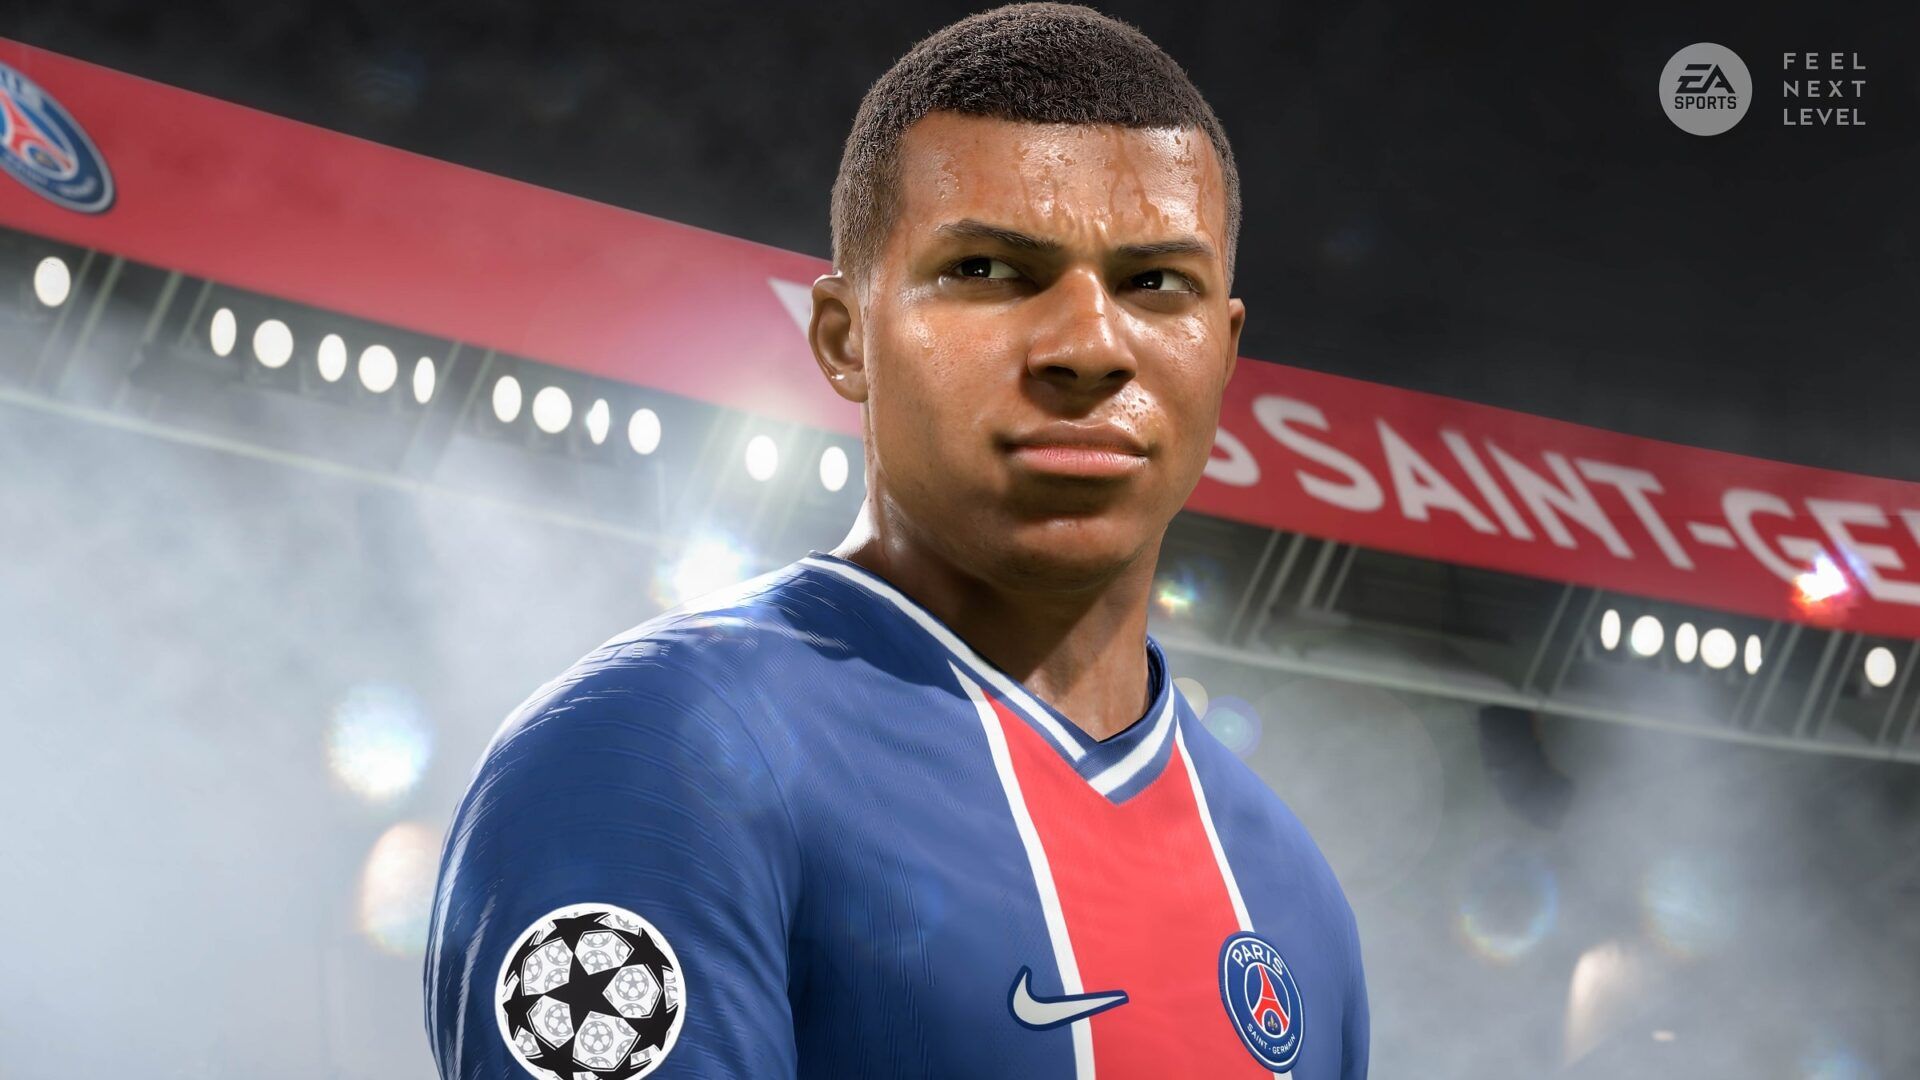 FIFA 22 FUT Champs rewards